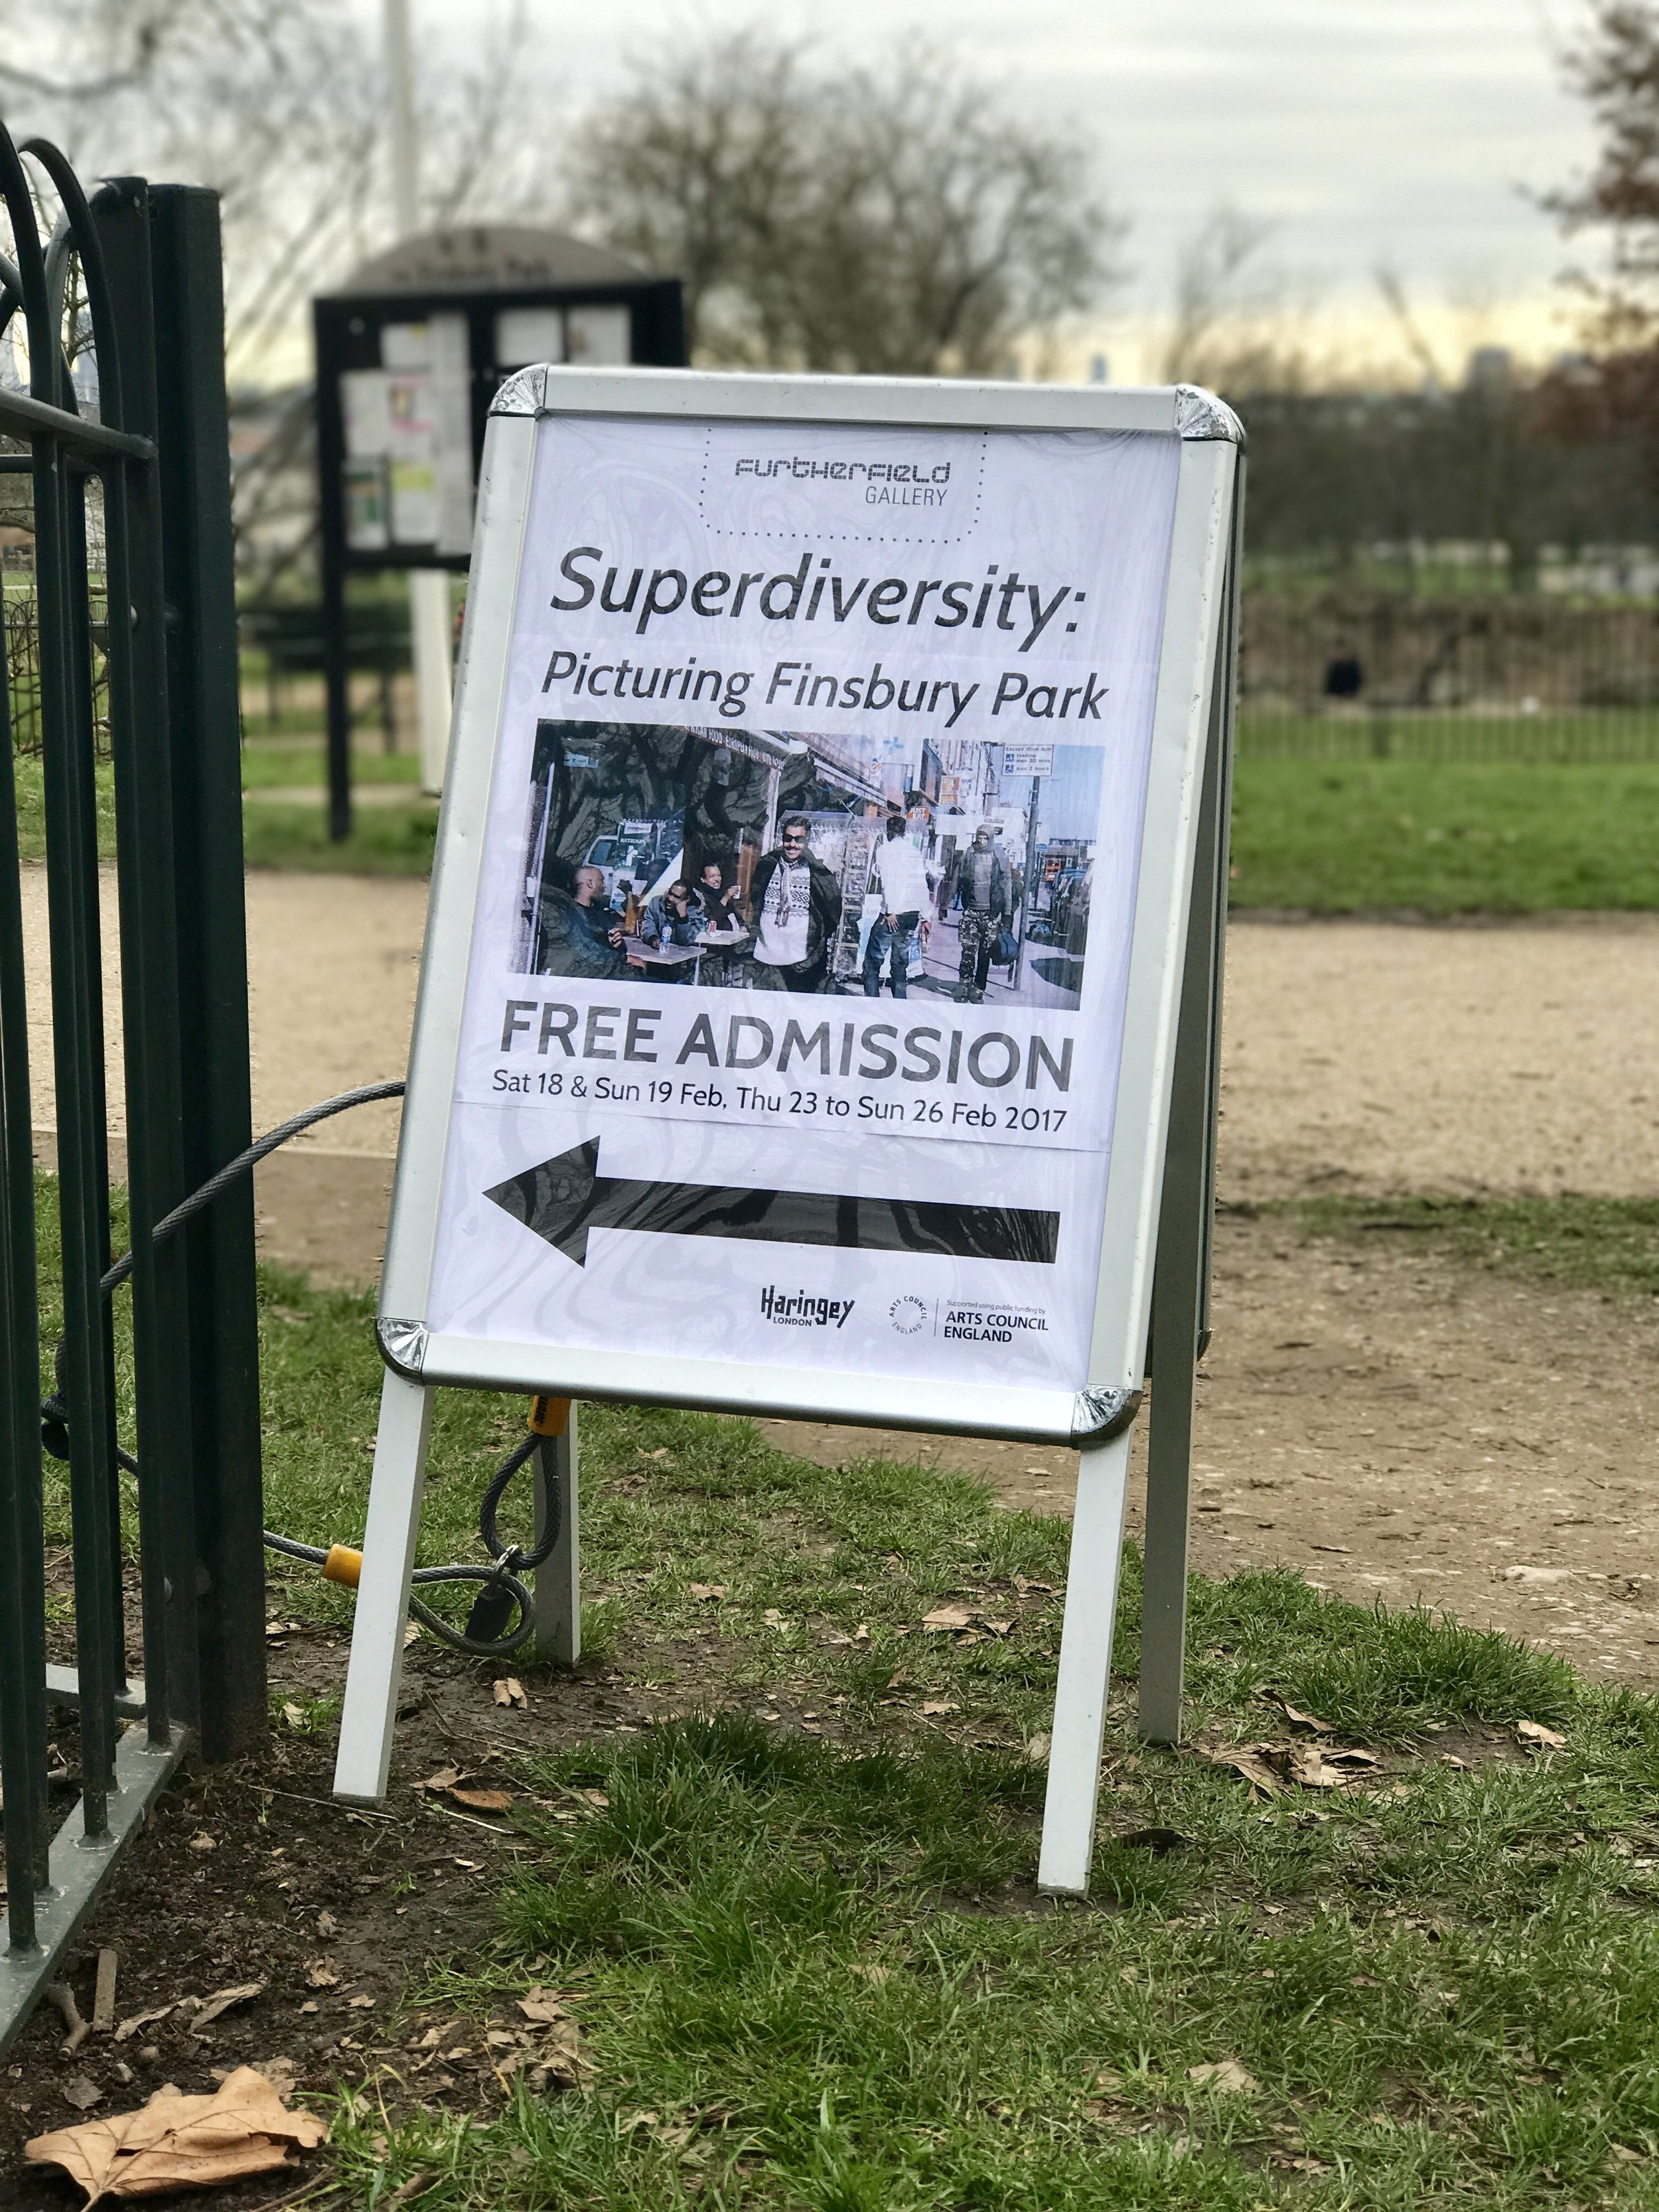 Superdiversity : Documentary encounters, multiculture & the city